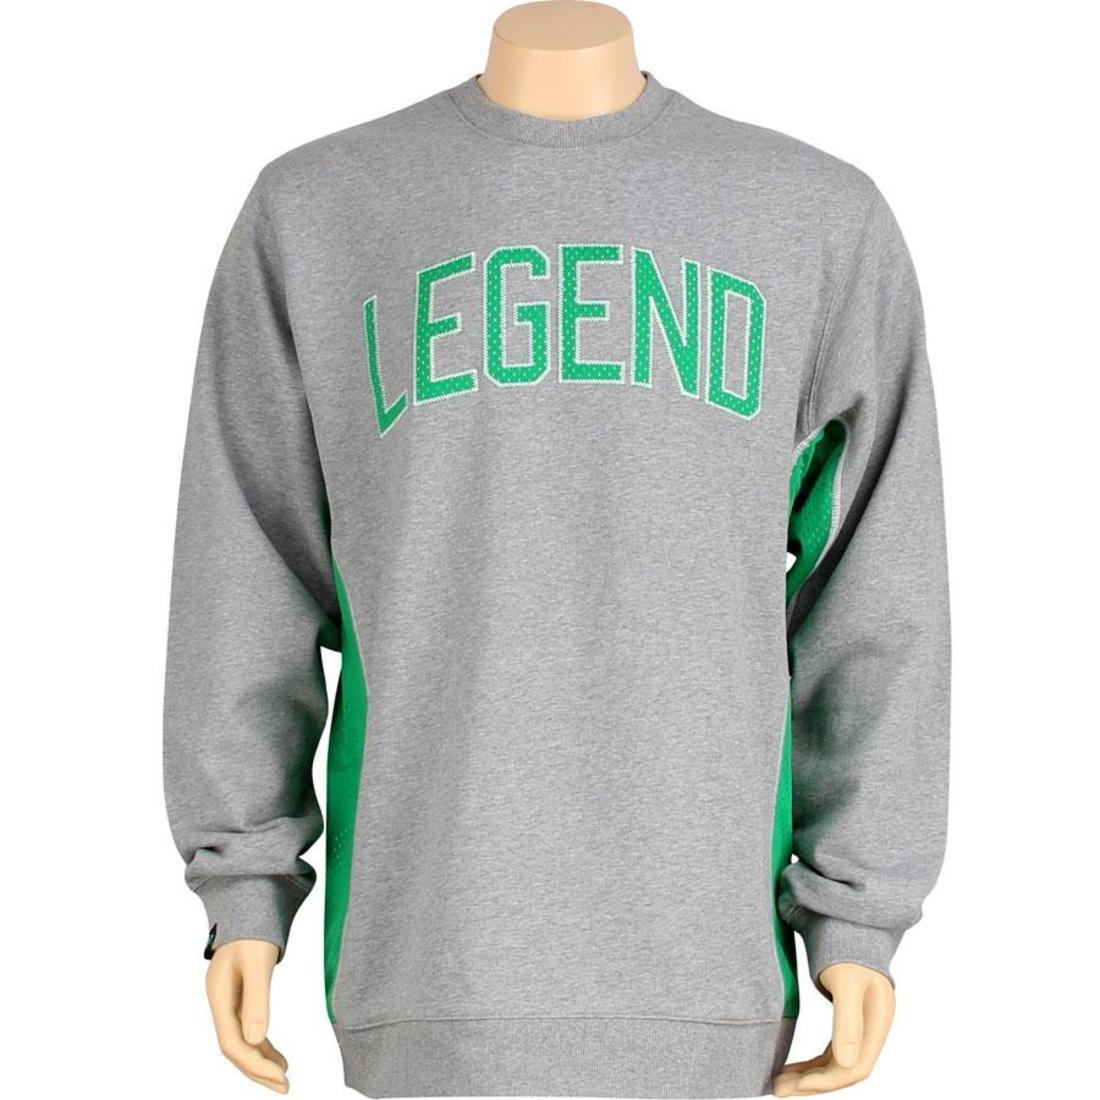 K1X レジェンド 灰色 グレ ボストン ヘザー 緑 グリーン 【 LEGEND HEATHER GREEN K1X LARRY CREWNECK GREY BOSTON 】 メンズファッション トップス Tシャツ カットソー